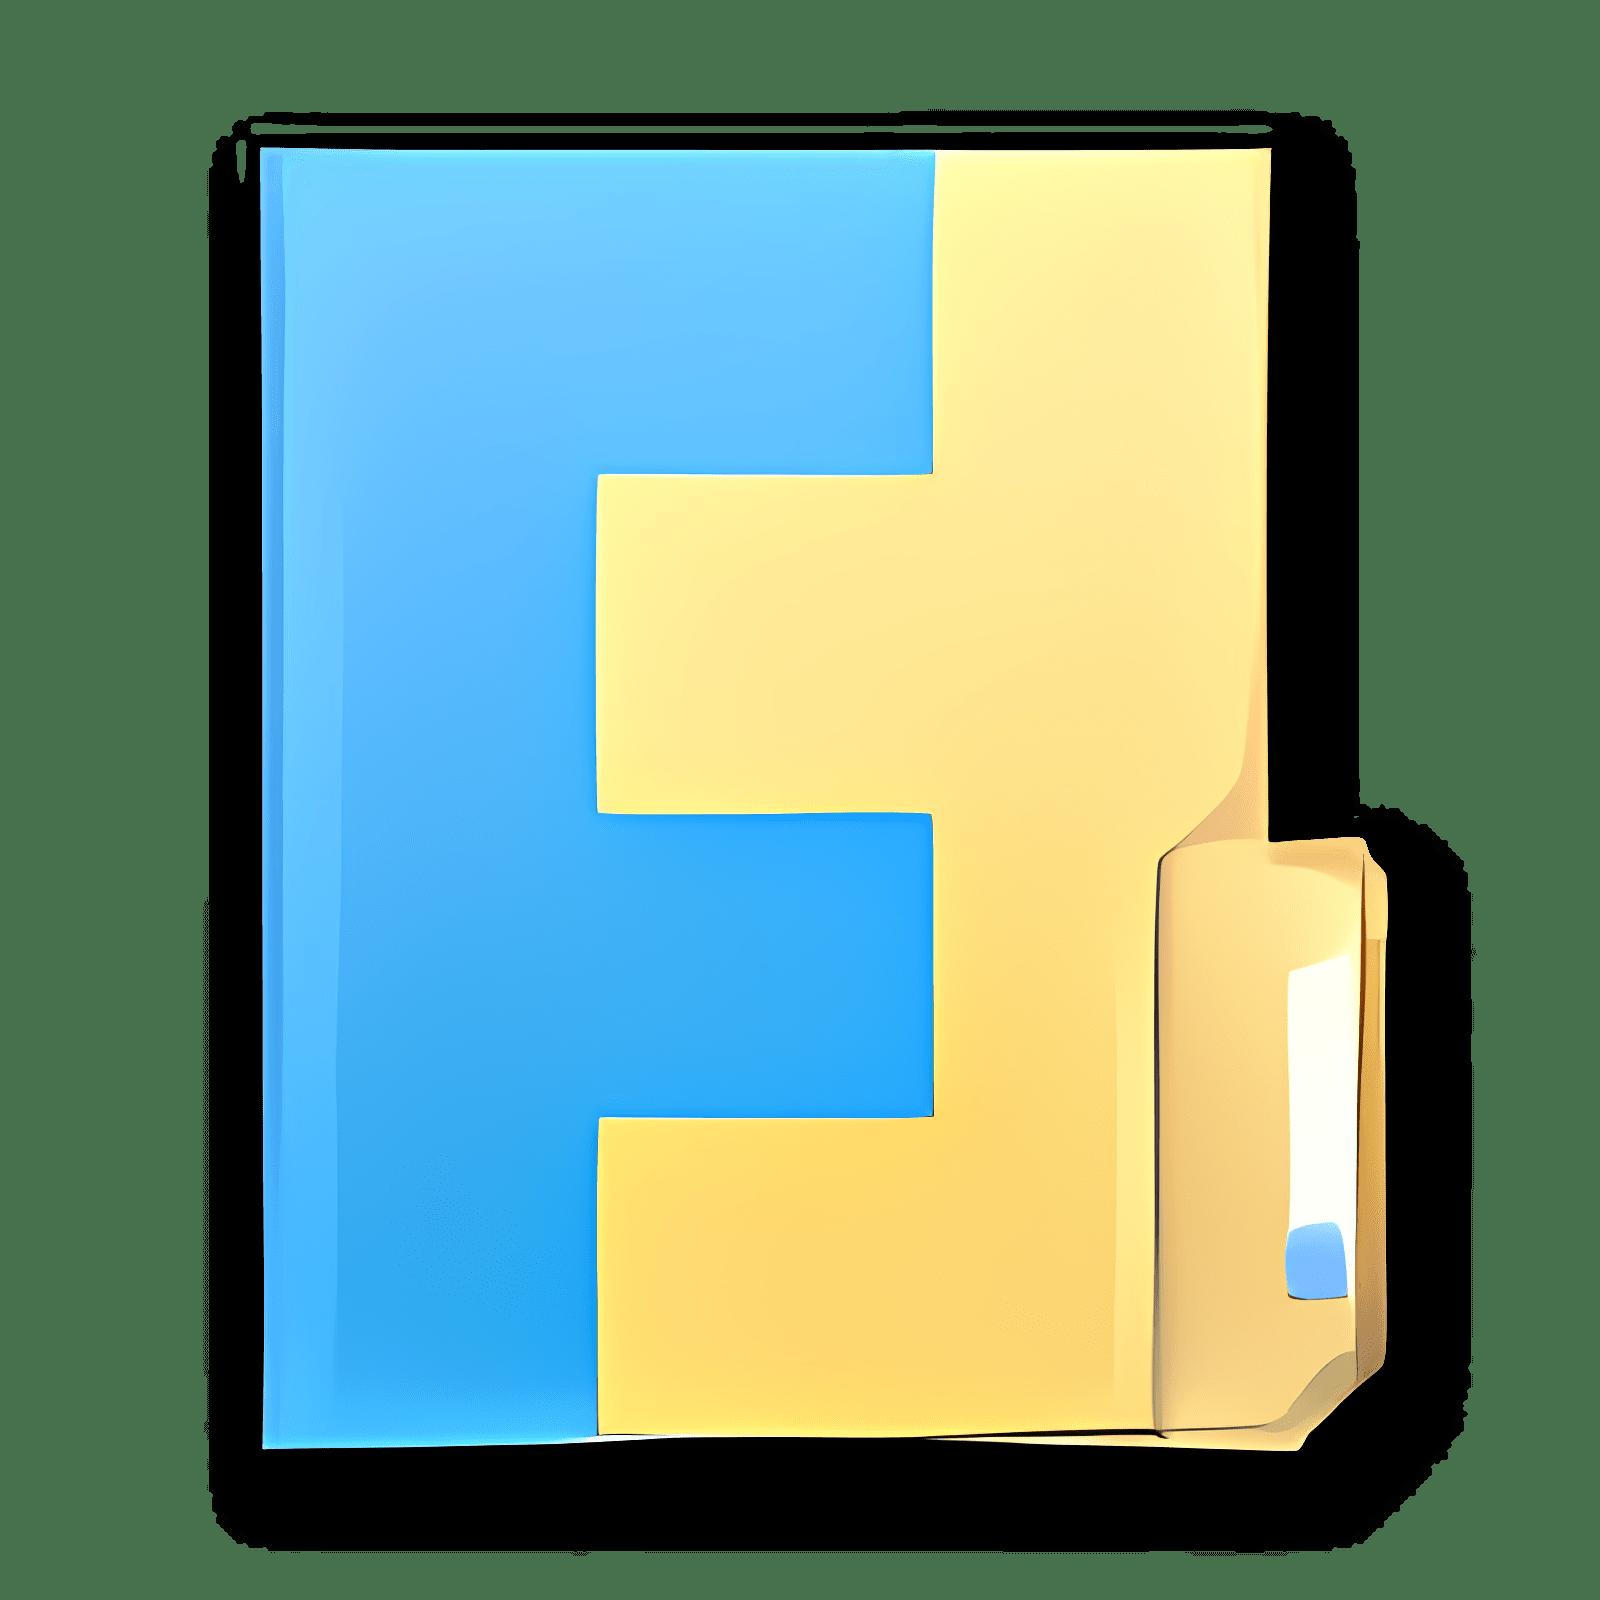 Windows Live Sync